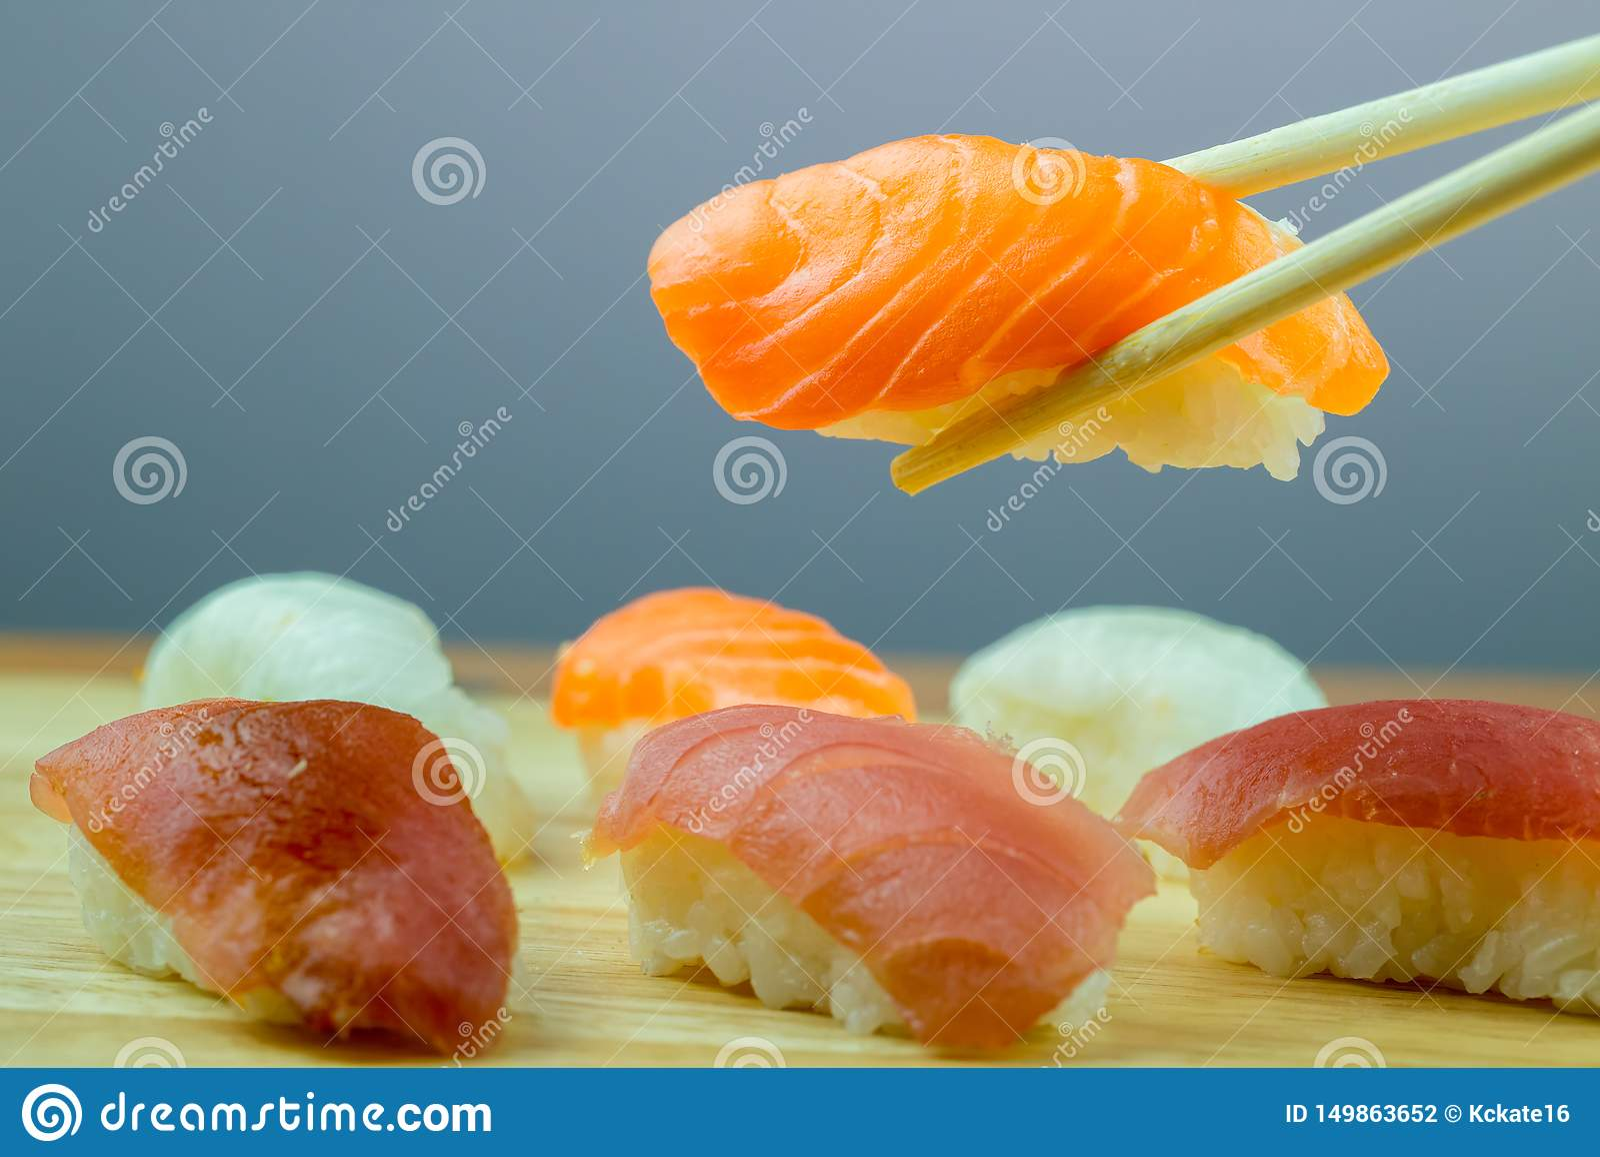 Fresh salmon sushi , salmon maki roll Japanese food restaurant, salmon sushi on plate.